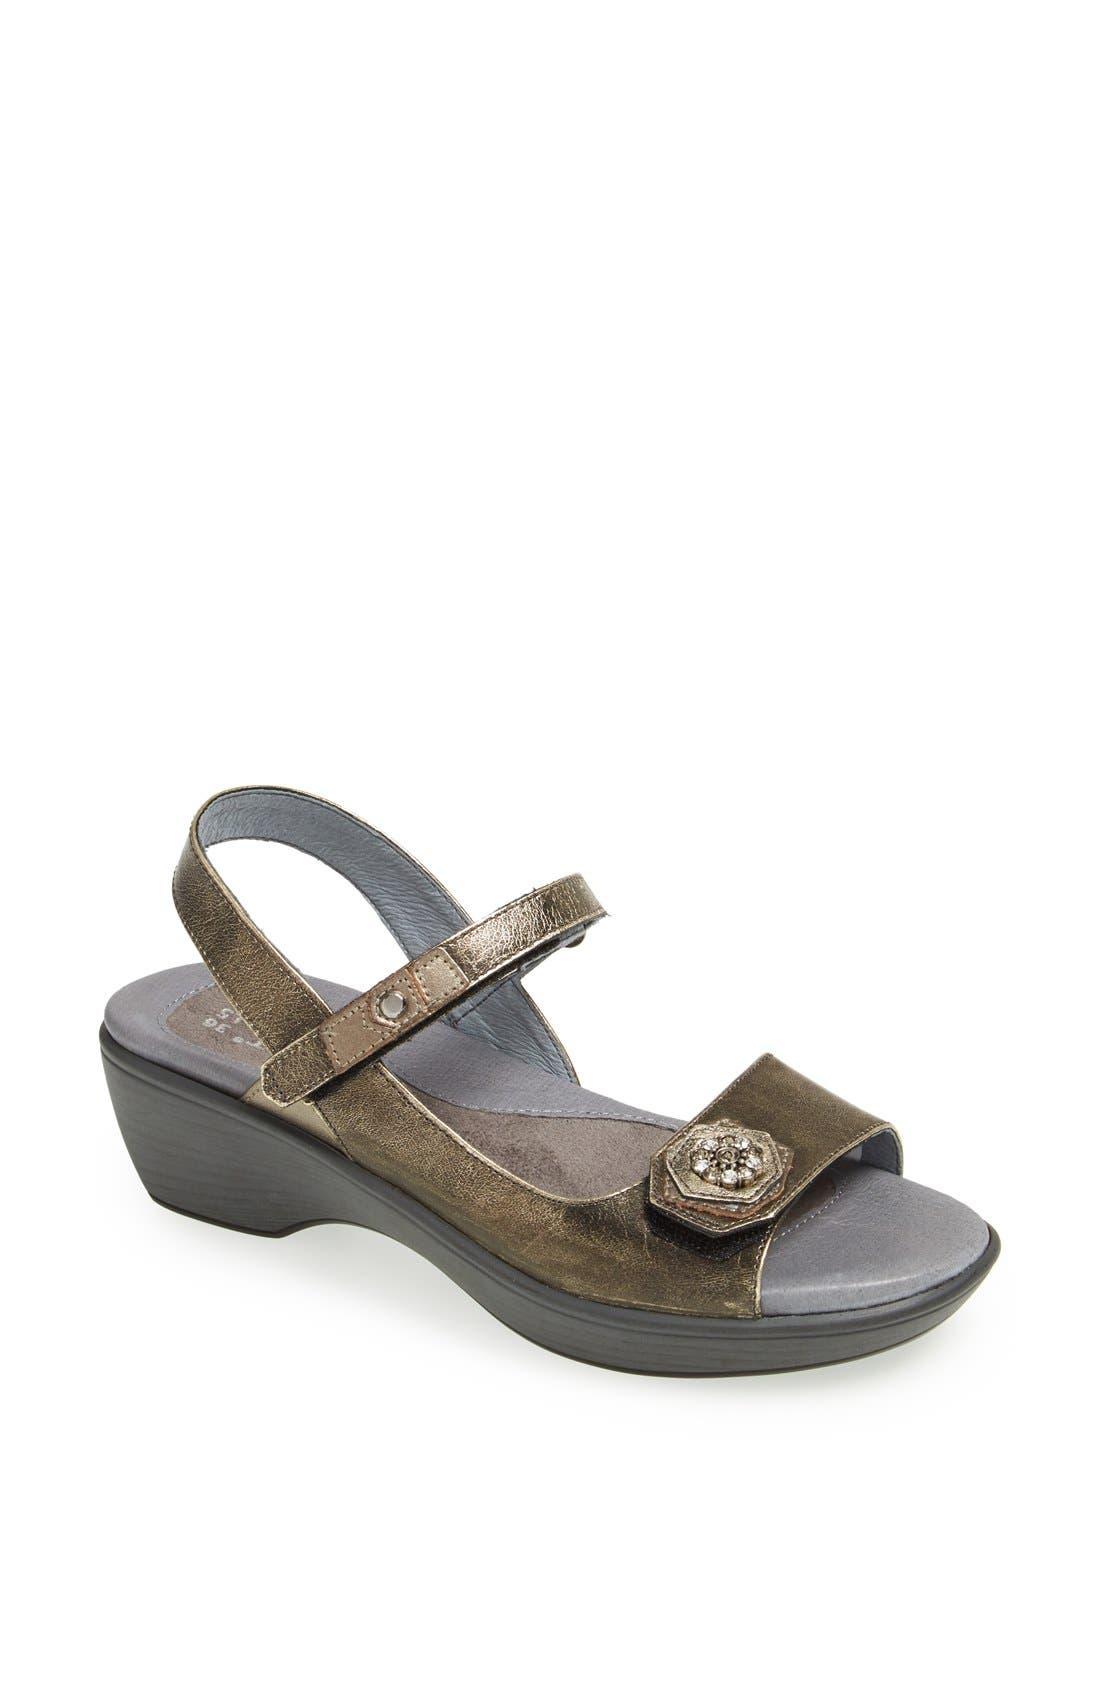 NAOT Reserve Sandal